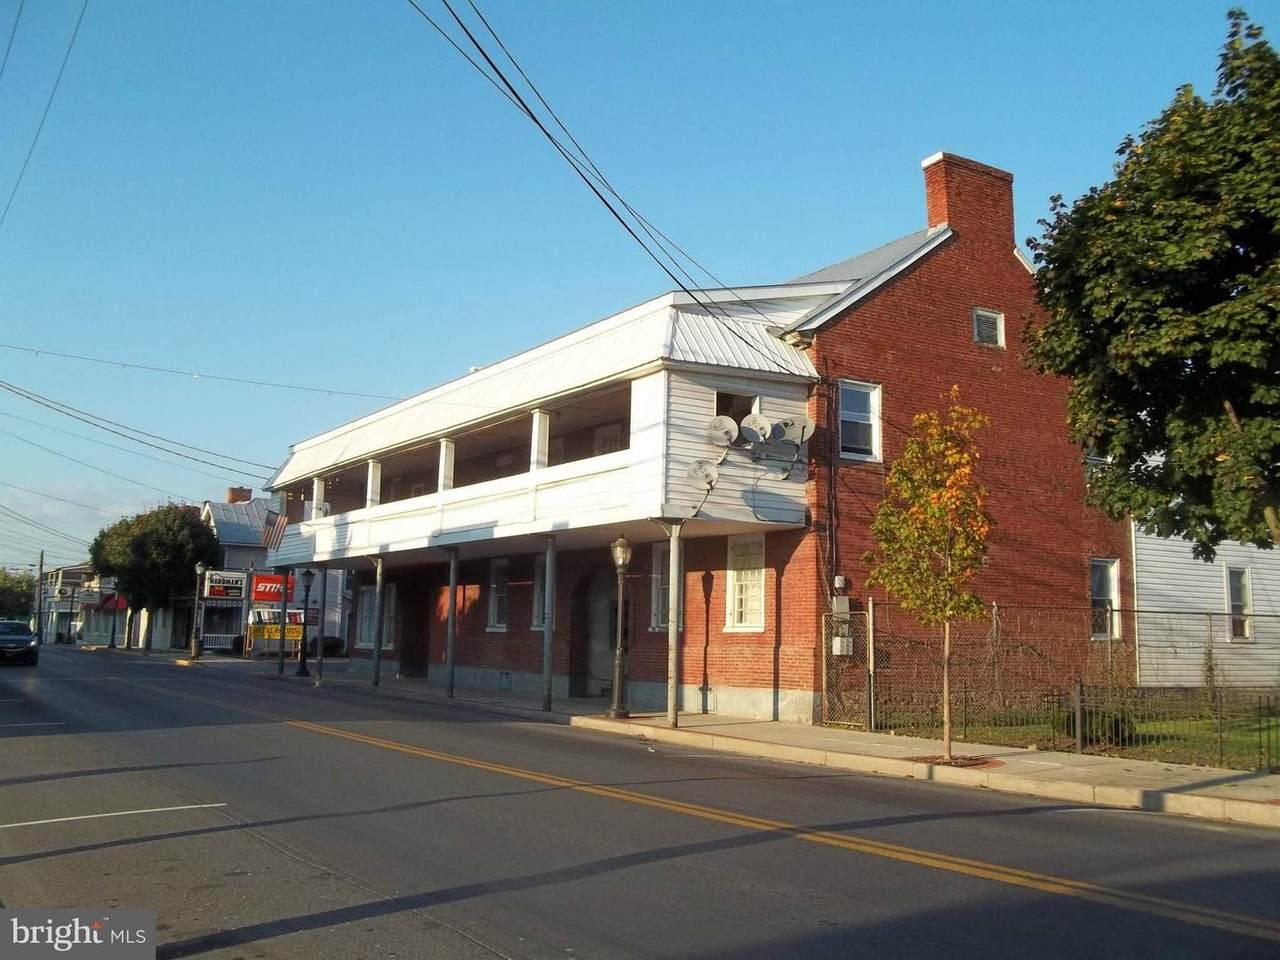 127 North Main Street - Photo 1